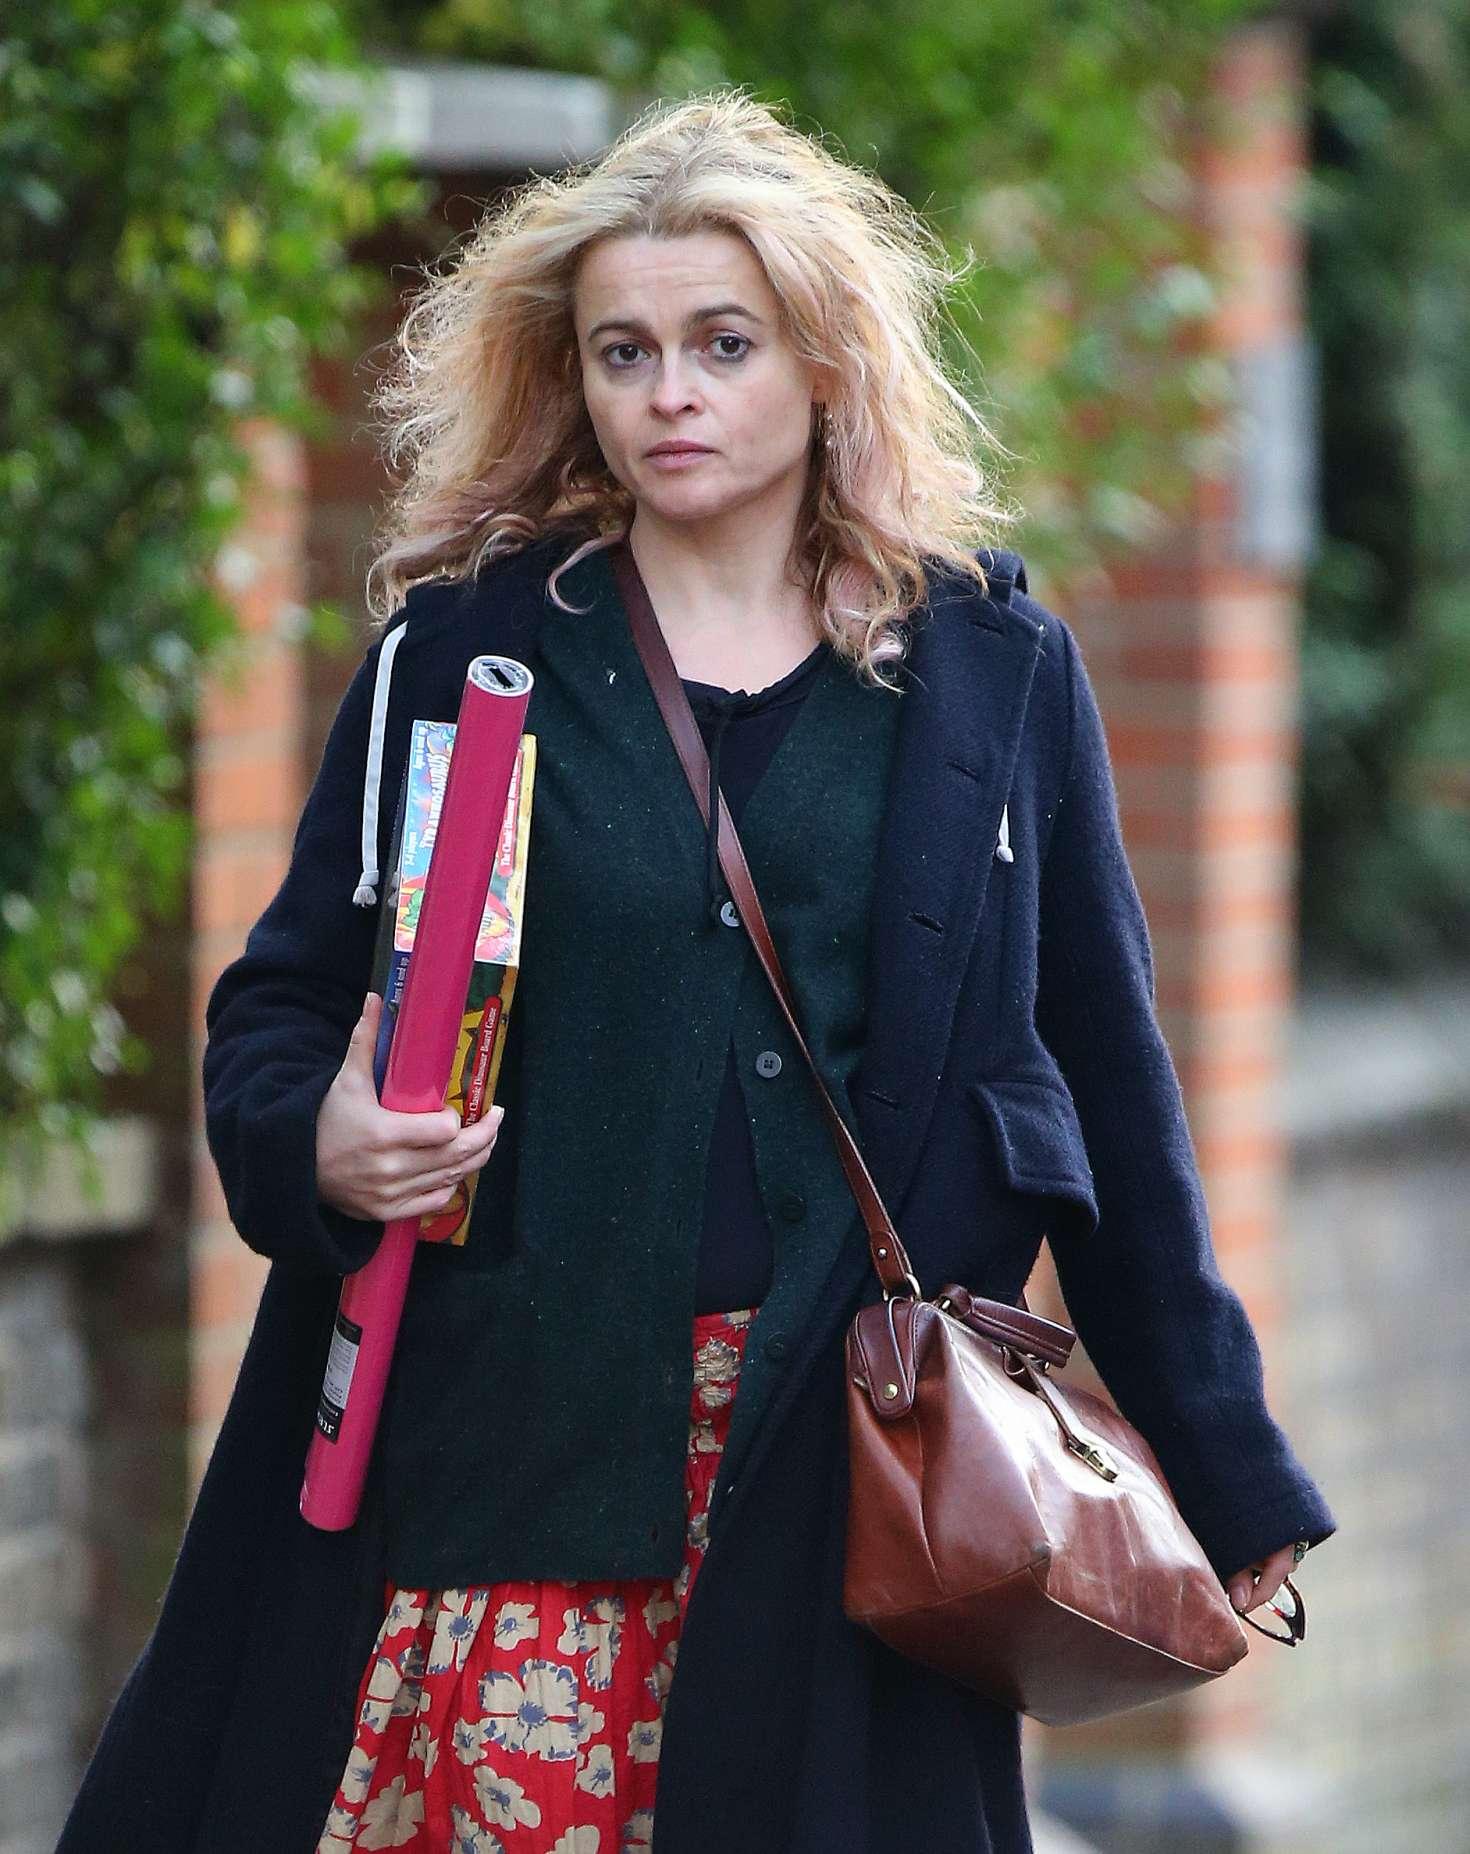 Helena Bonham Carter 2016 : Helena Bonham Carter: Christmas Shopping in London -09